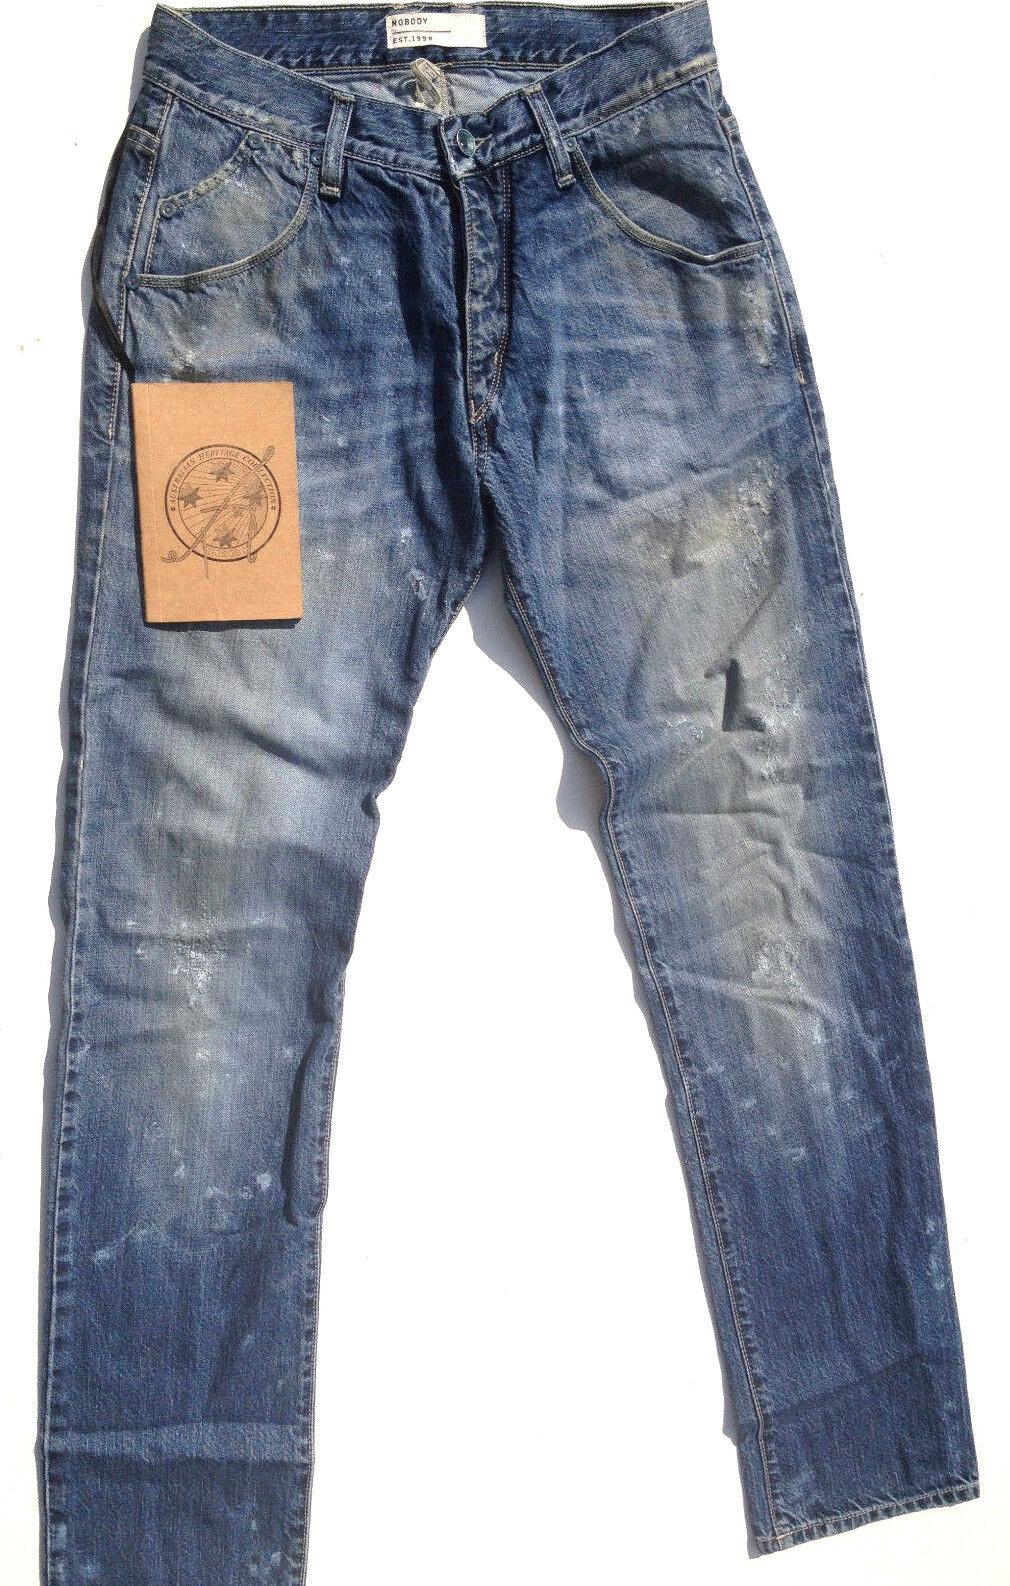 Nobody Destroy Jeans 'COLONIAL JEAN' Size W29 L34 AU11 Trawl NEW RRP 319 Womens